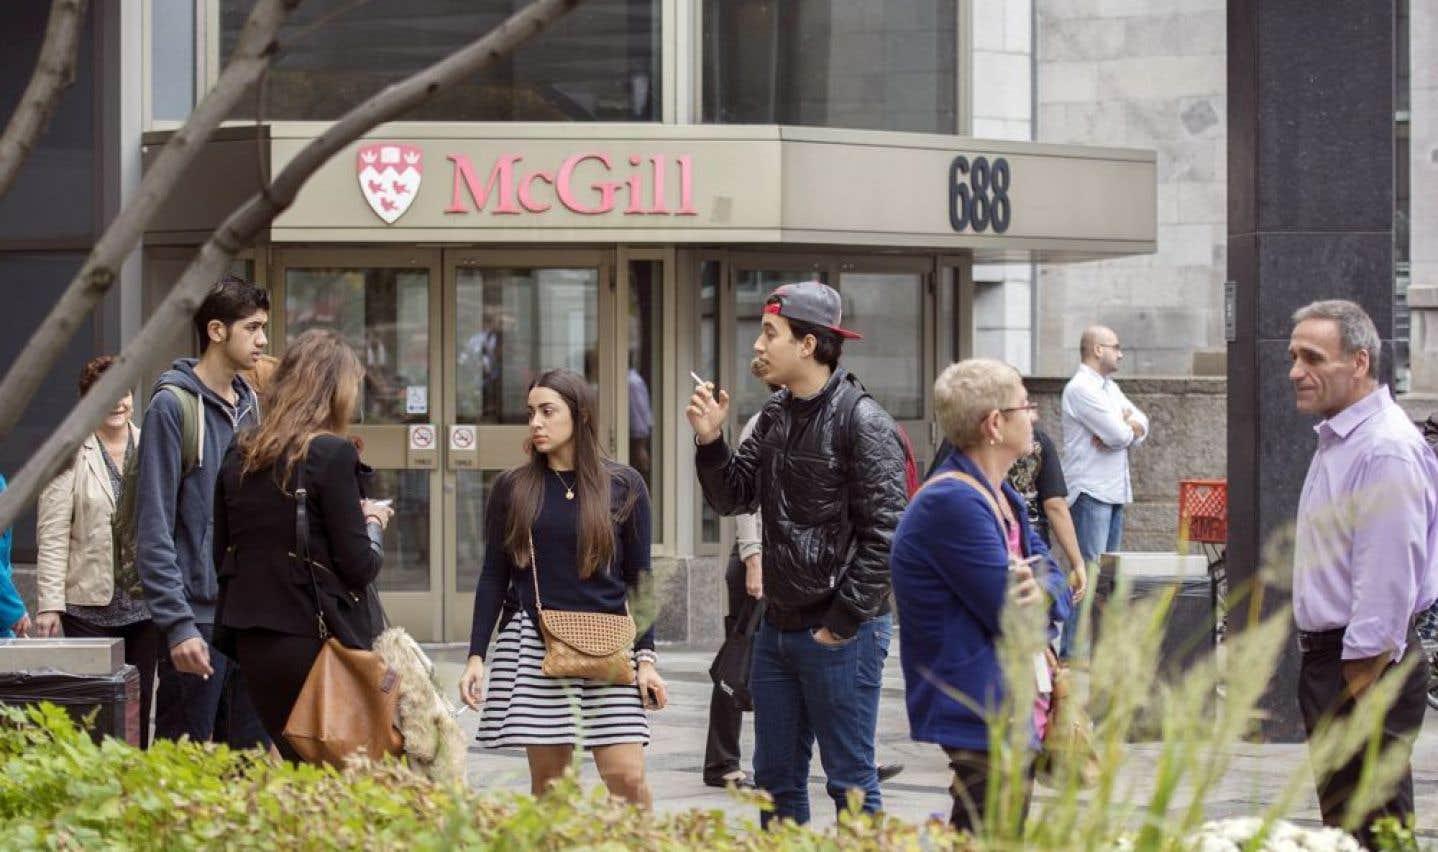 Une attaque contre l'université, selon la FEUQ